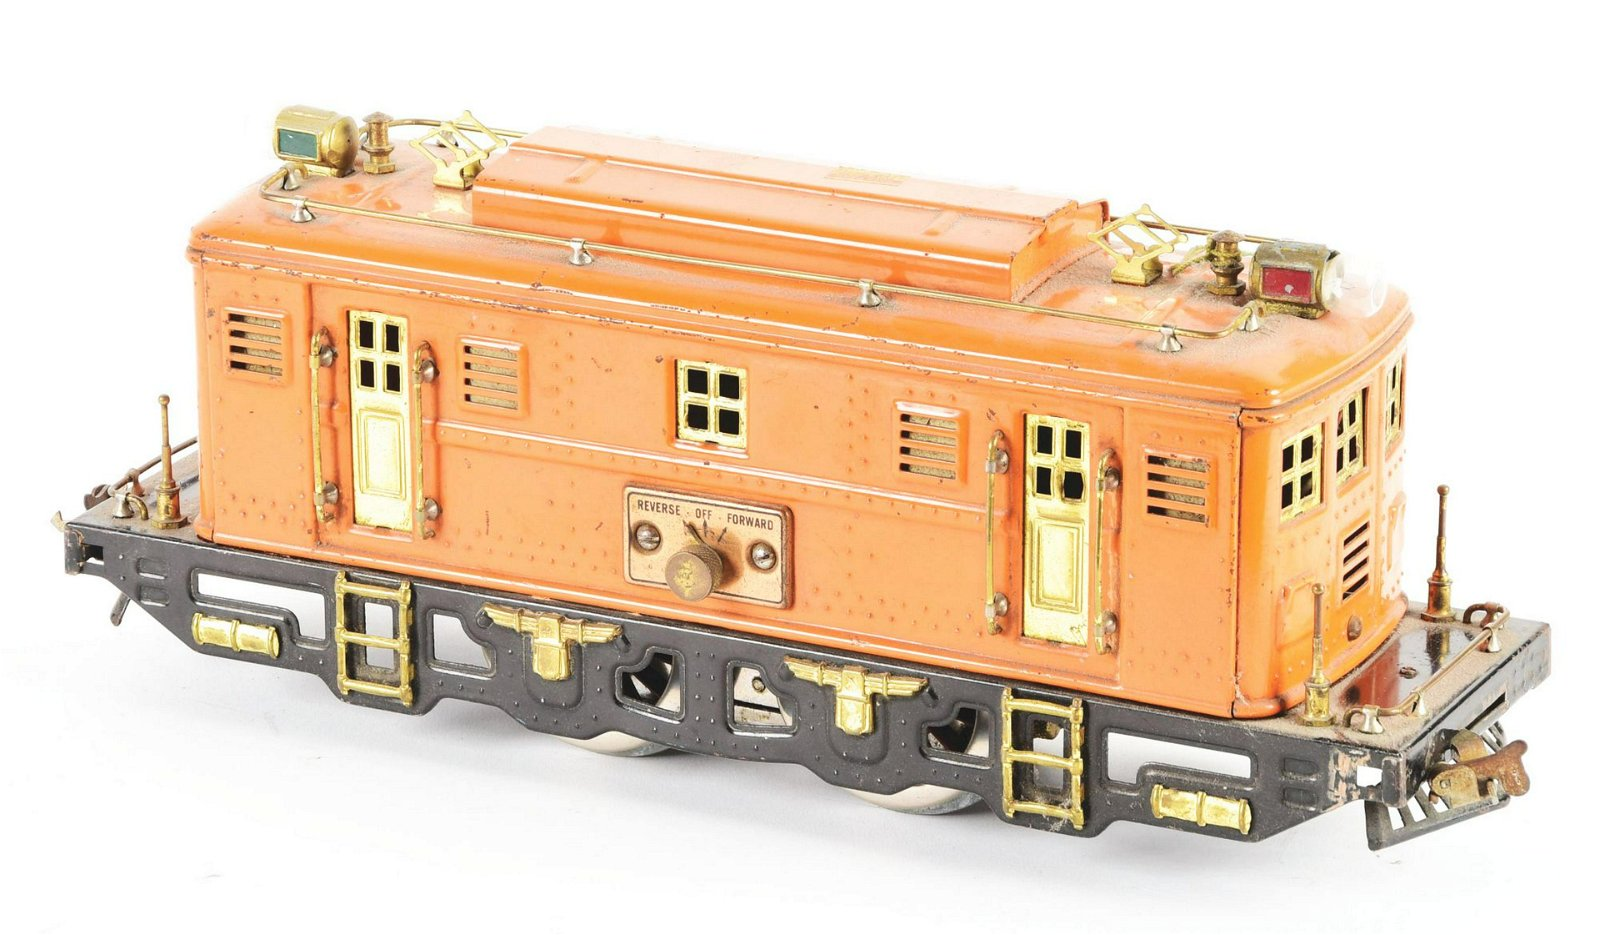 Lionel Orange 9-U Locomotive.